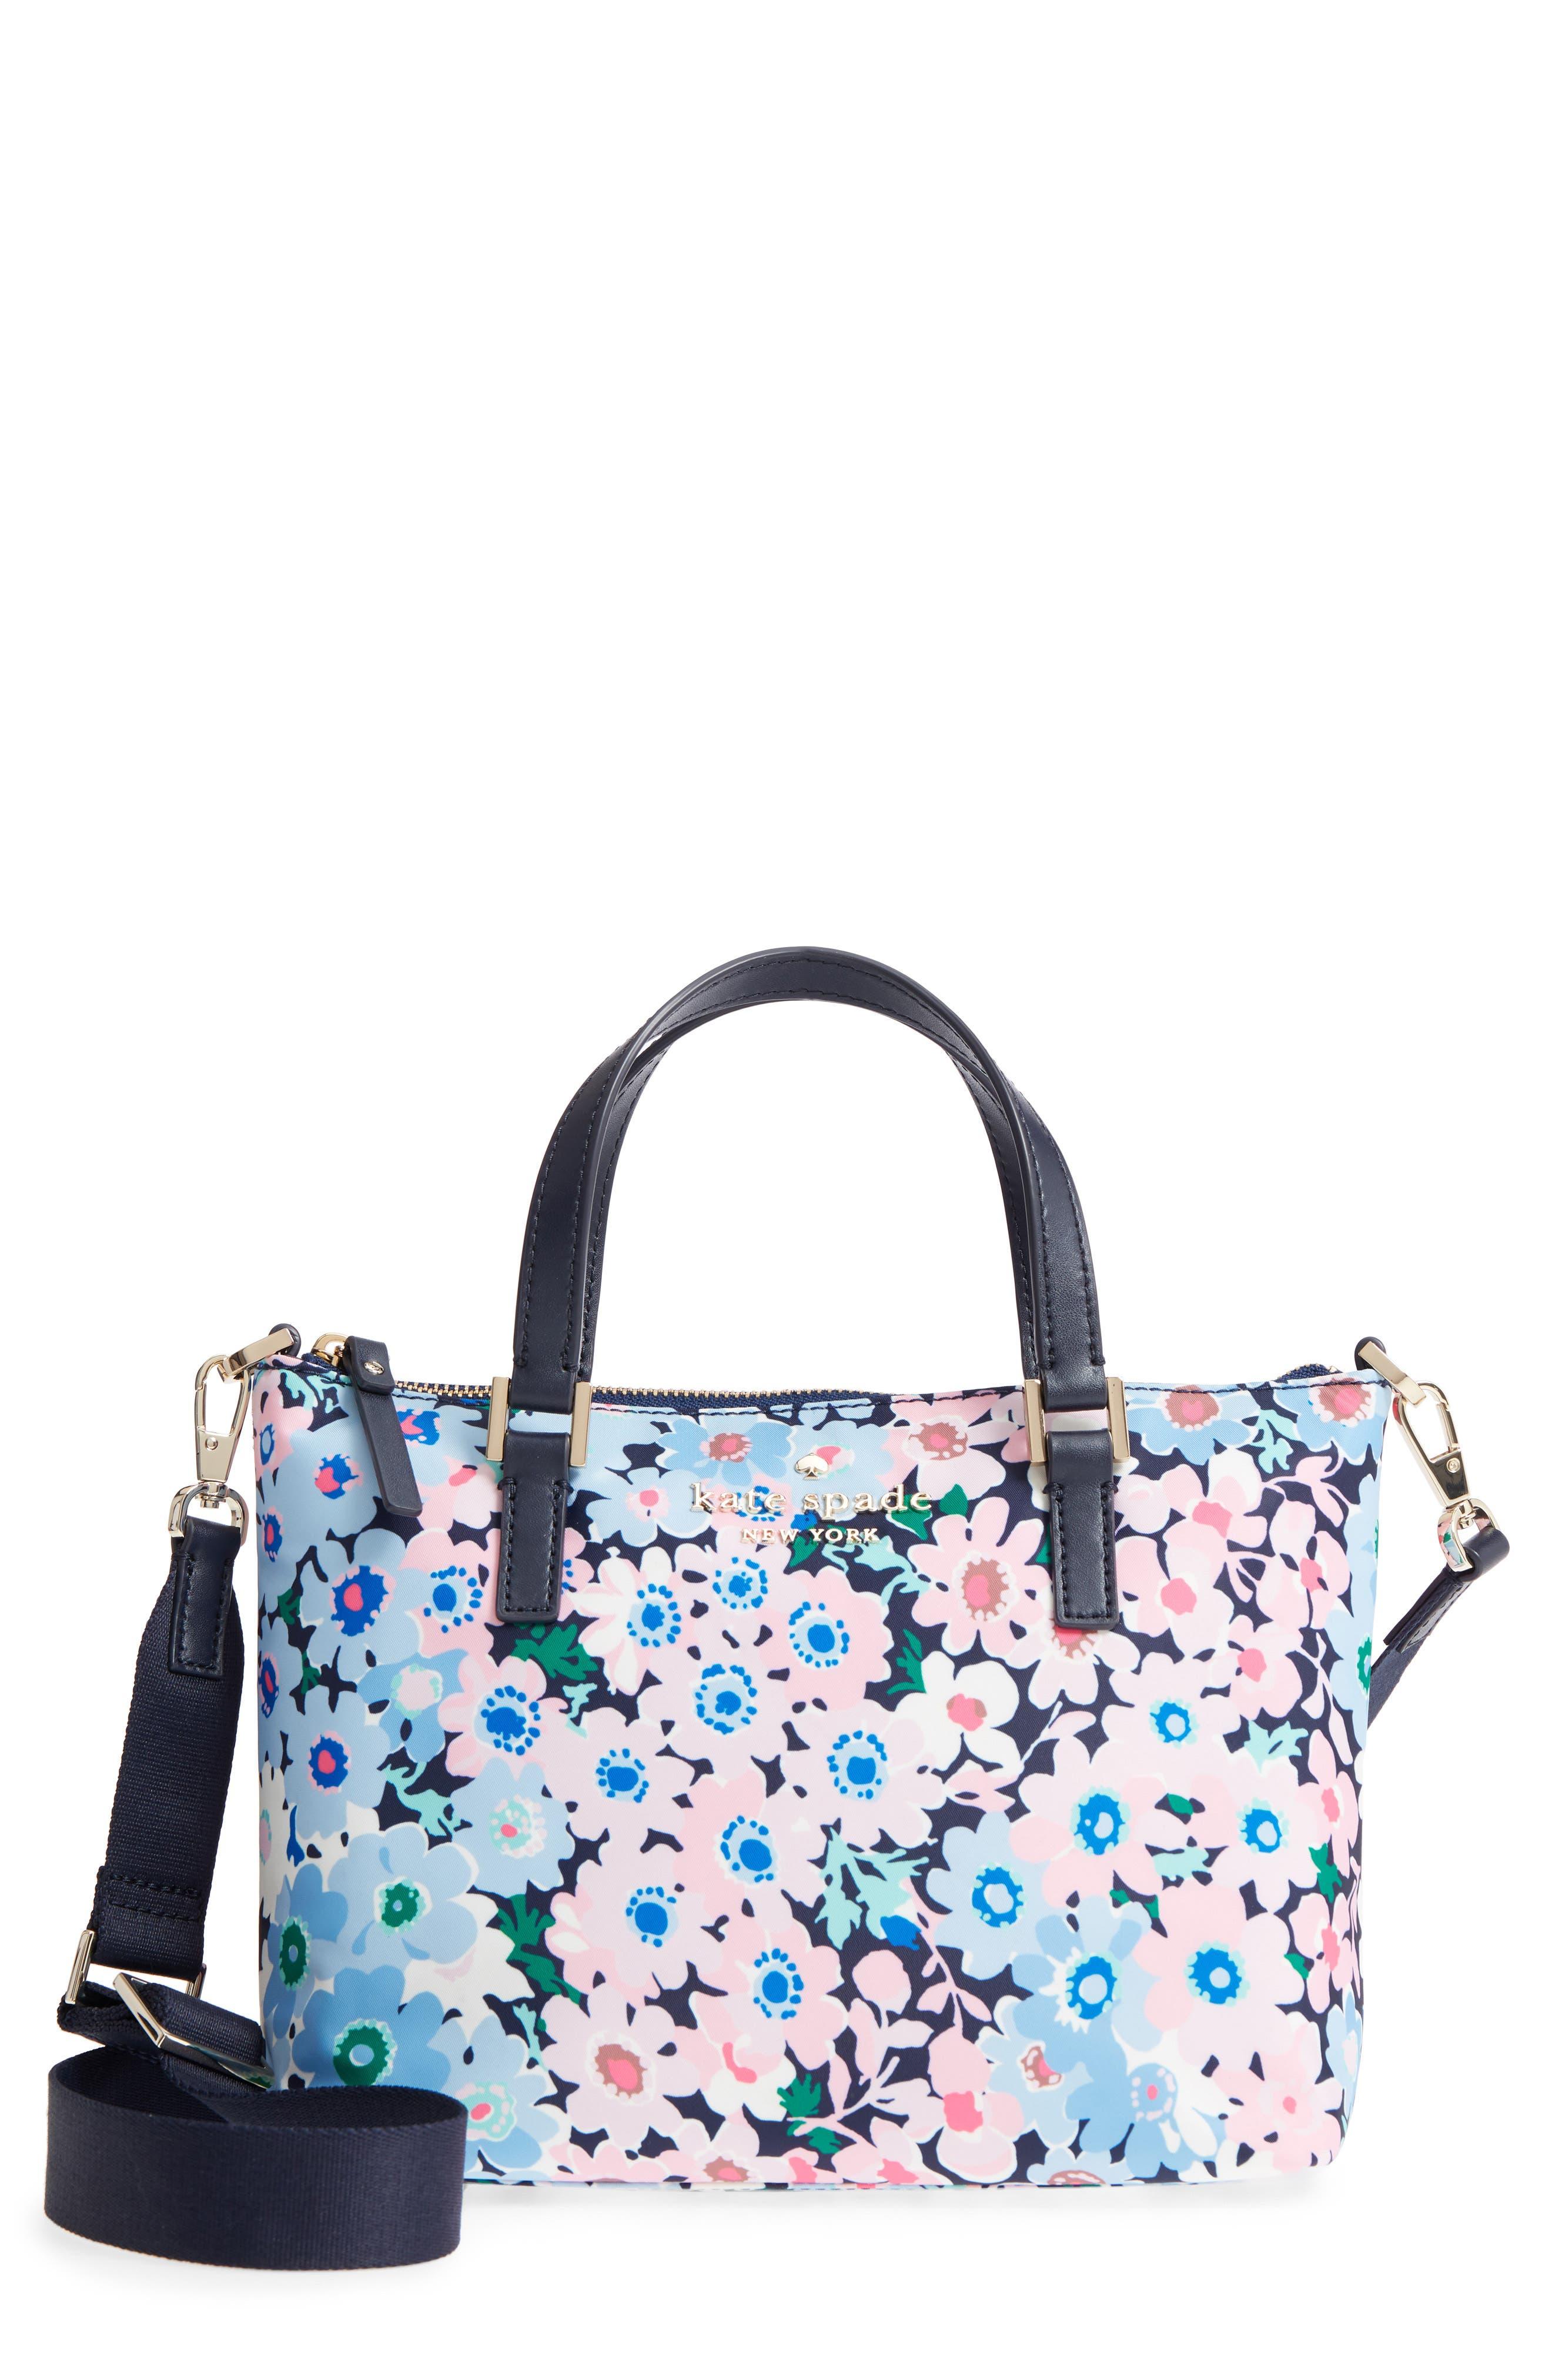 watson lane - daisy garden lucie crossbody bag,                         Main,                         color, Blue Multi